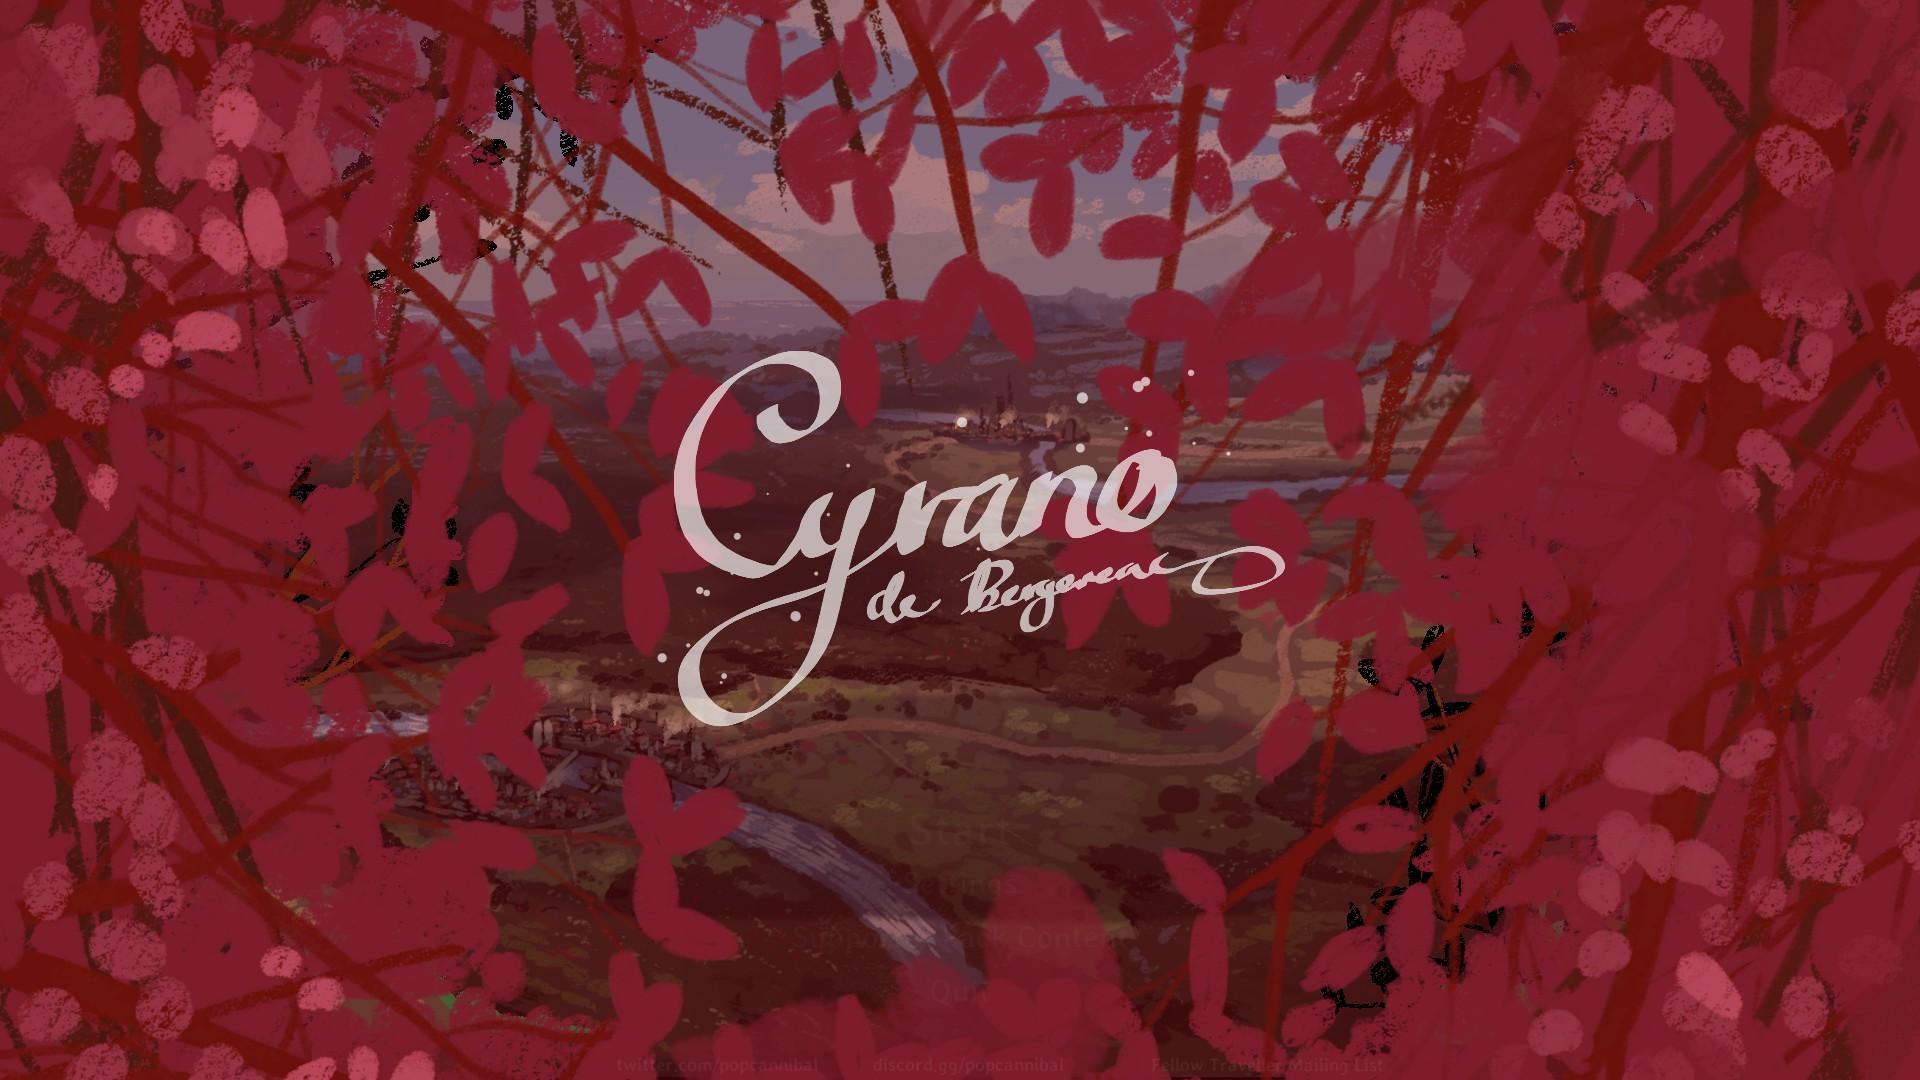 Cyrano - Feature Image